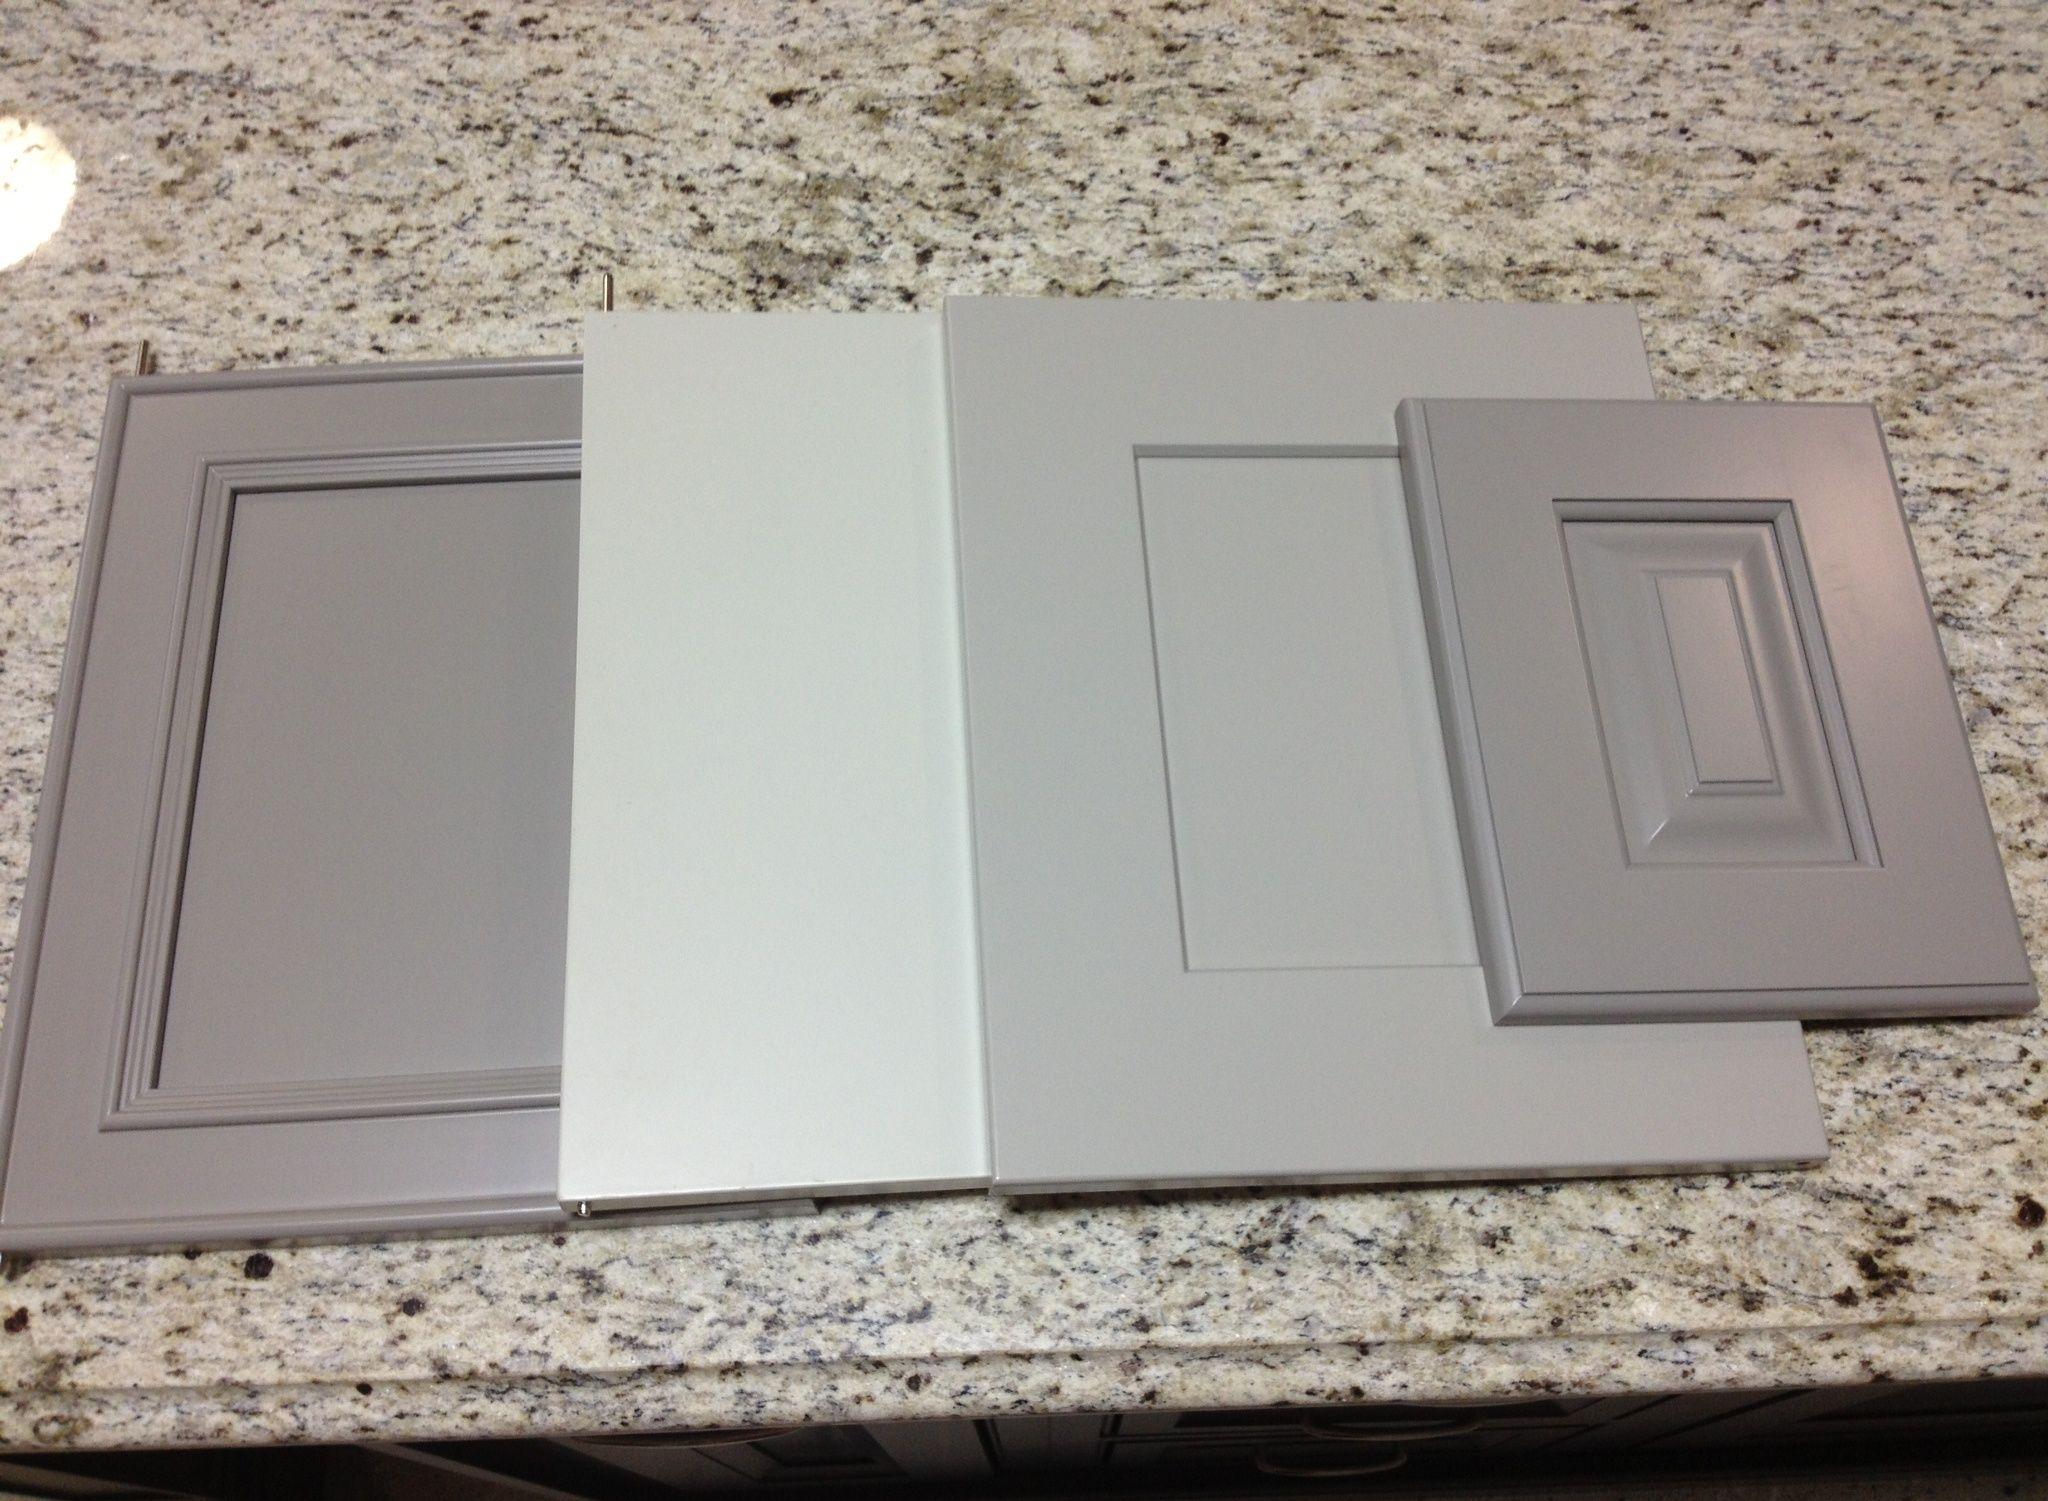 grey kitchen cabinets gray cabinets black counters slate herringbone floor marble hex backsplash accent Kitchen Design Pinterest Gray cabinets Gray kitchens and Custom